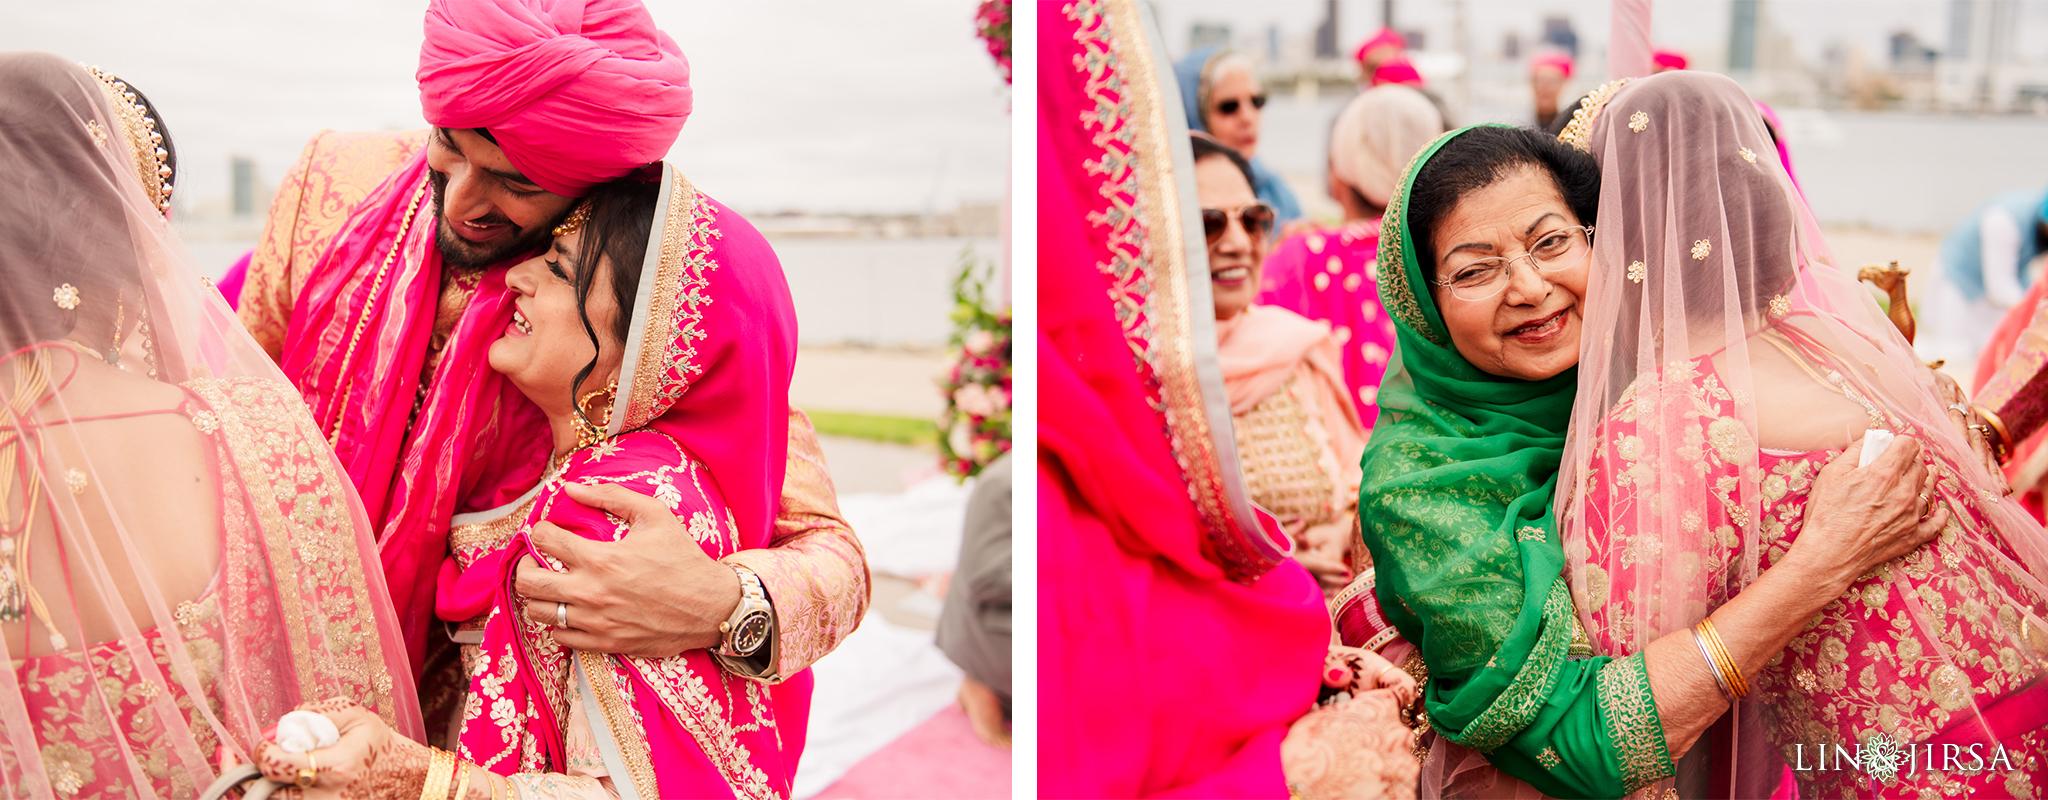 23 Coronado Resort and Spa San Diego Punjabi Wedding Photography